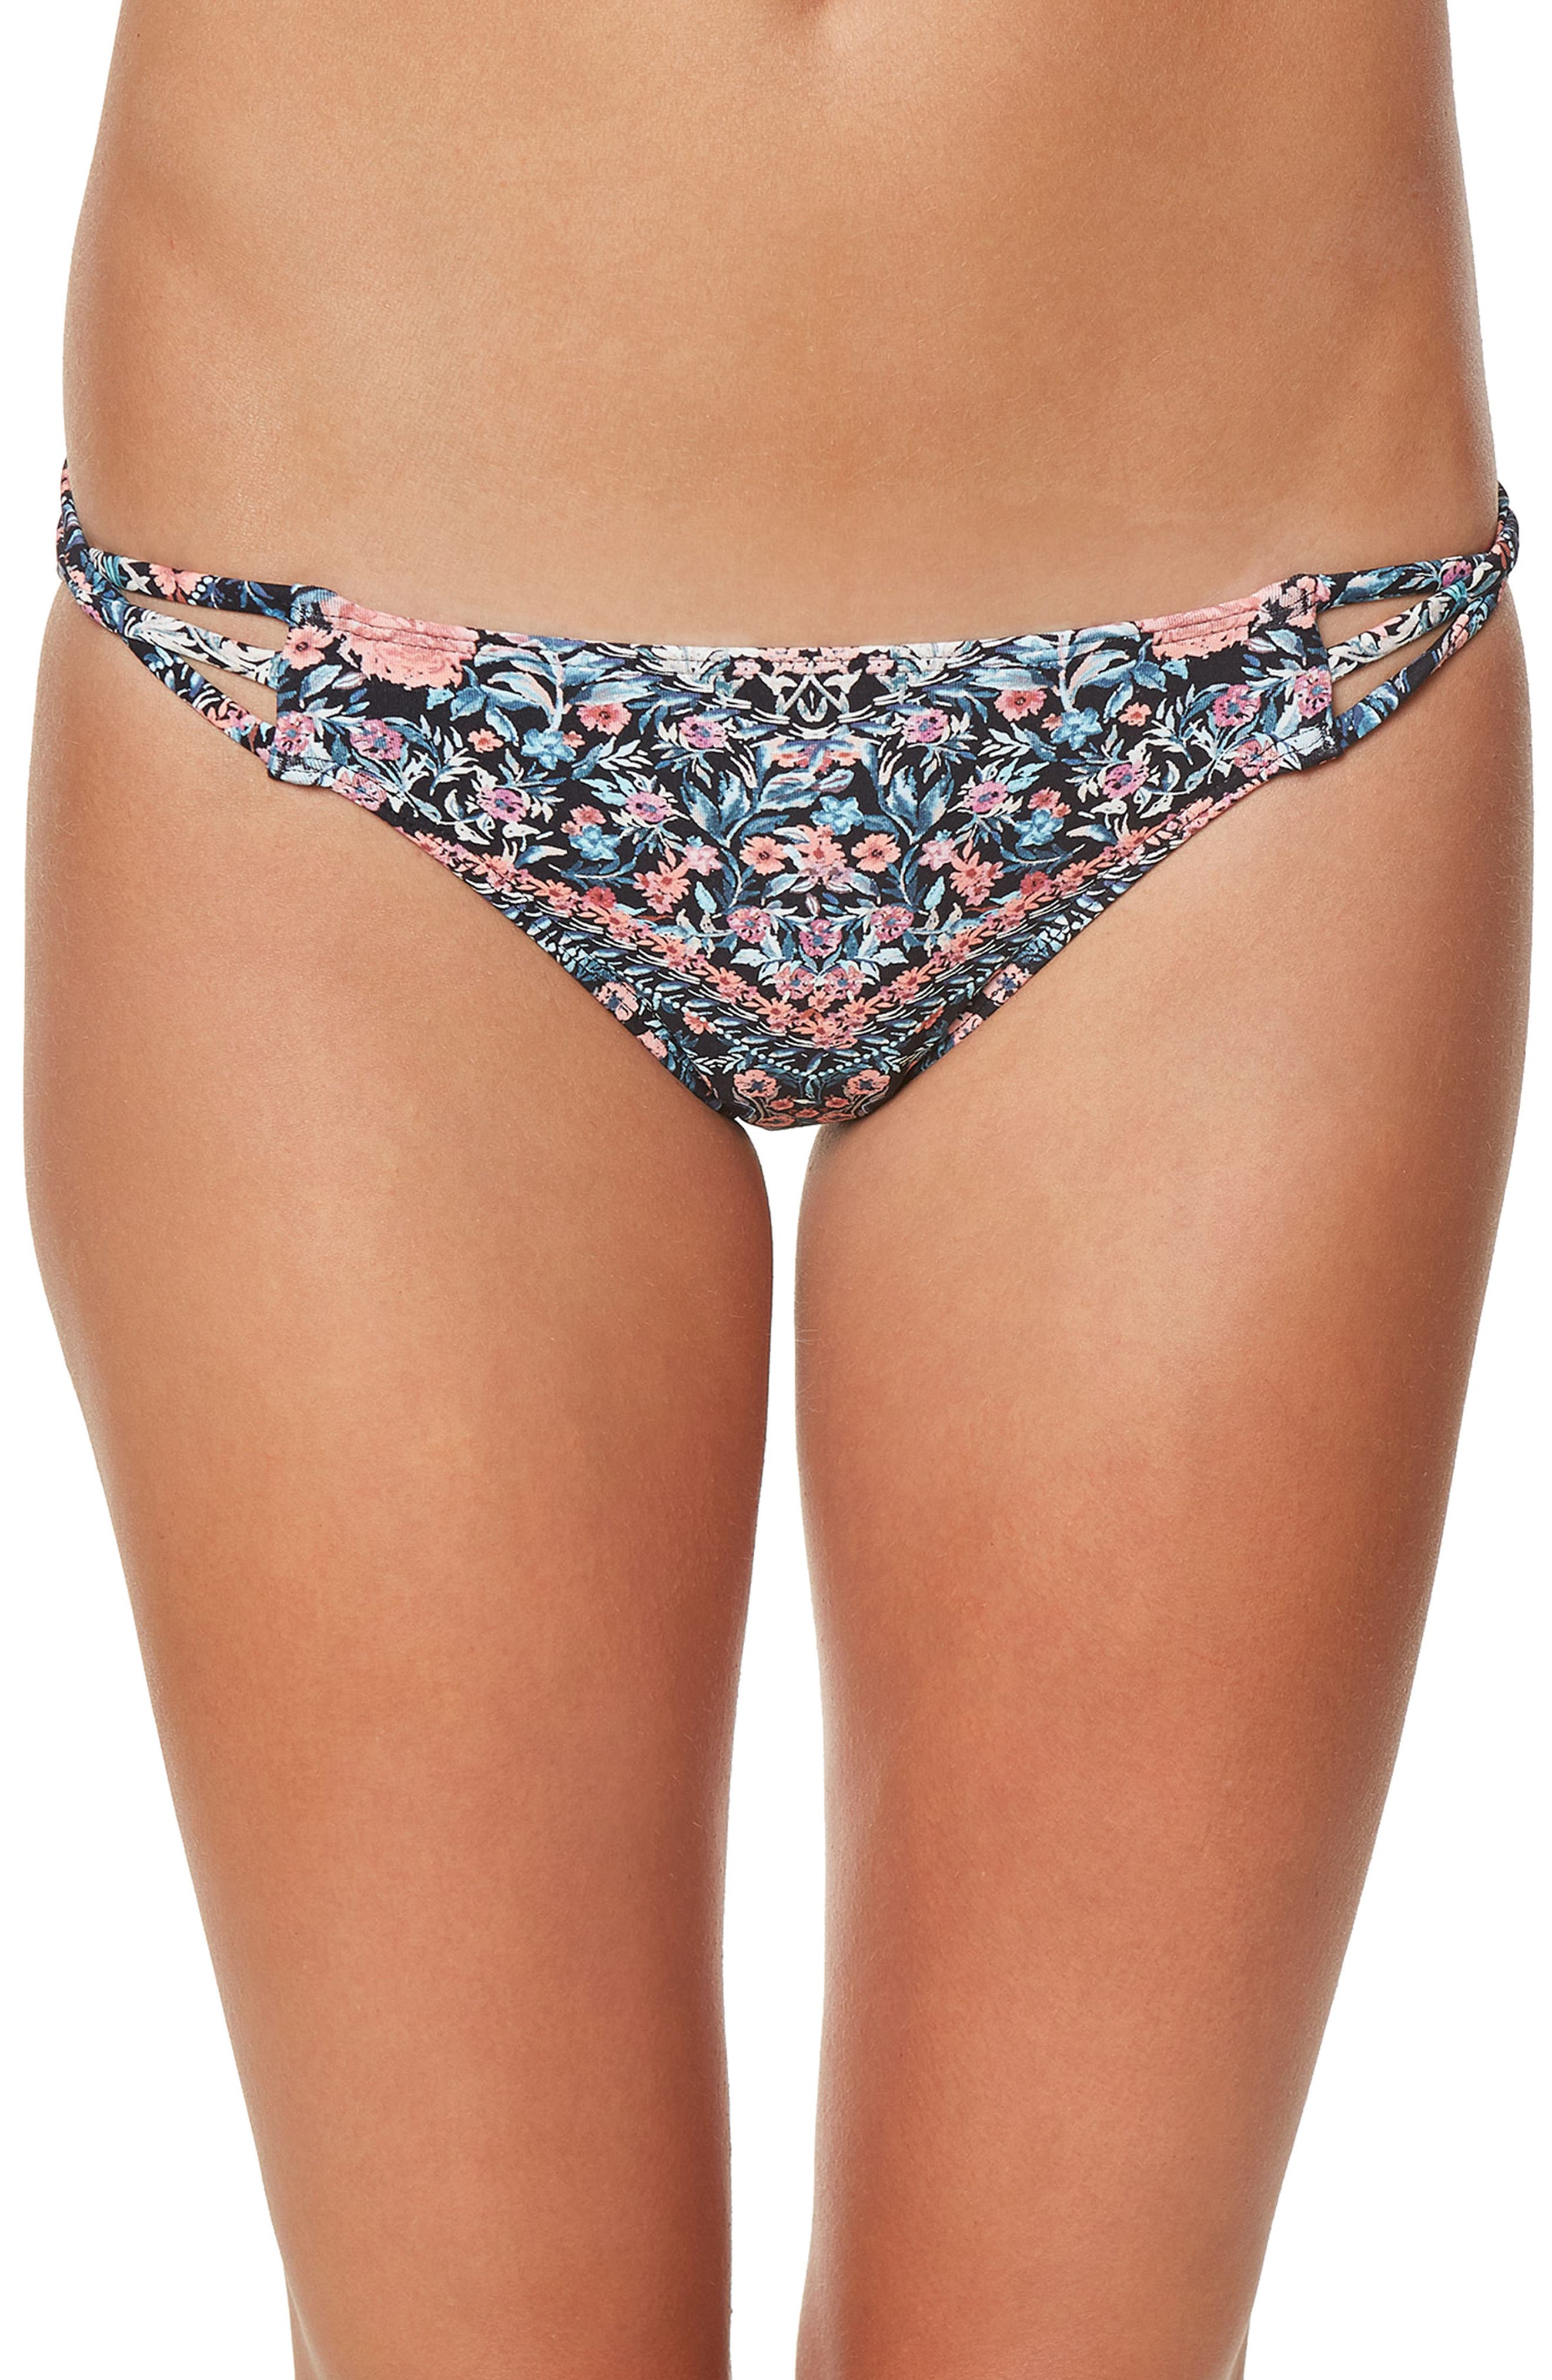 Alternate Image 1 Selected - O'Neill Porter Strappy Bikini Bottom